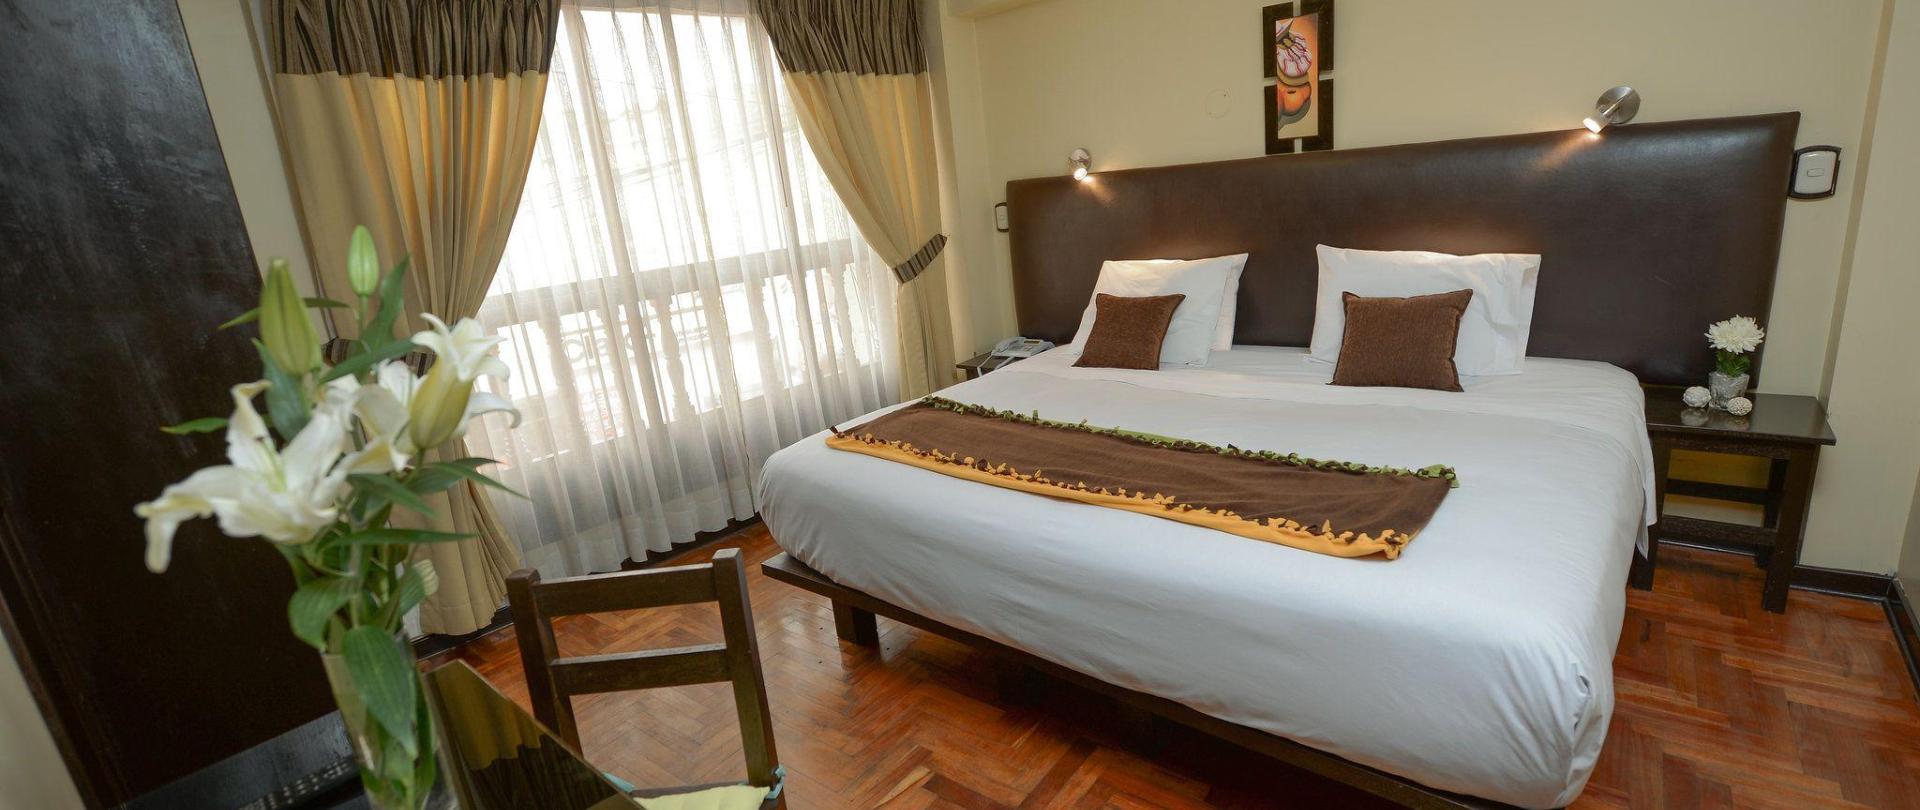 hotel-en-cusco_-tecte-guest-house_-habitacion-matrimonial-4.jpg